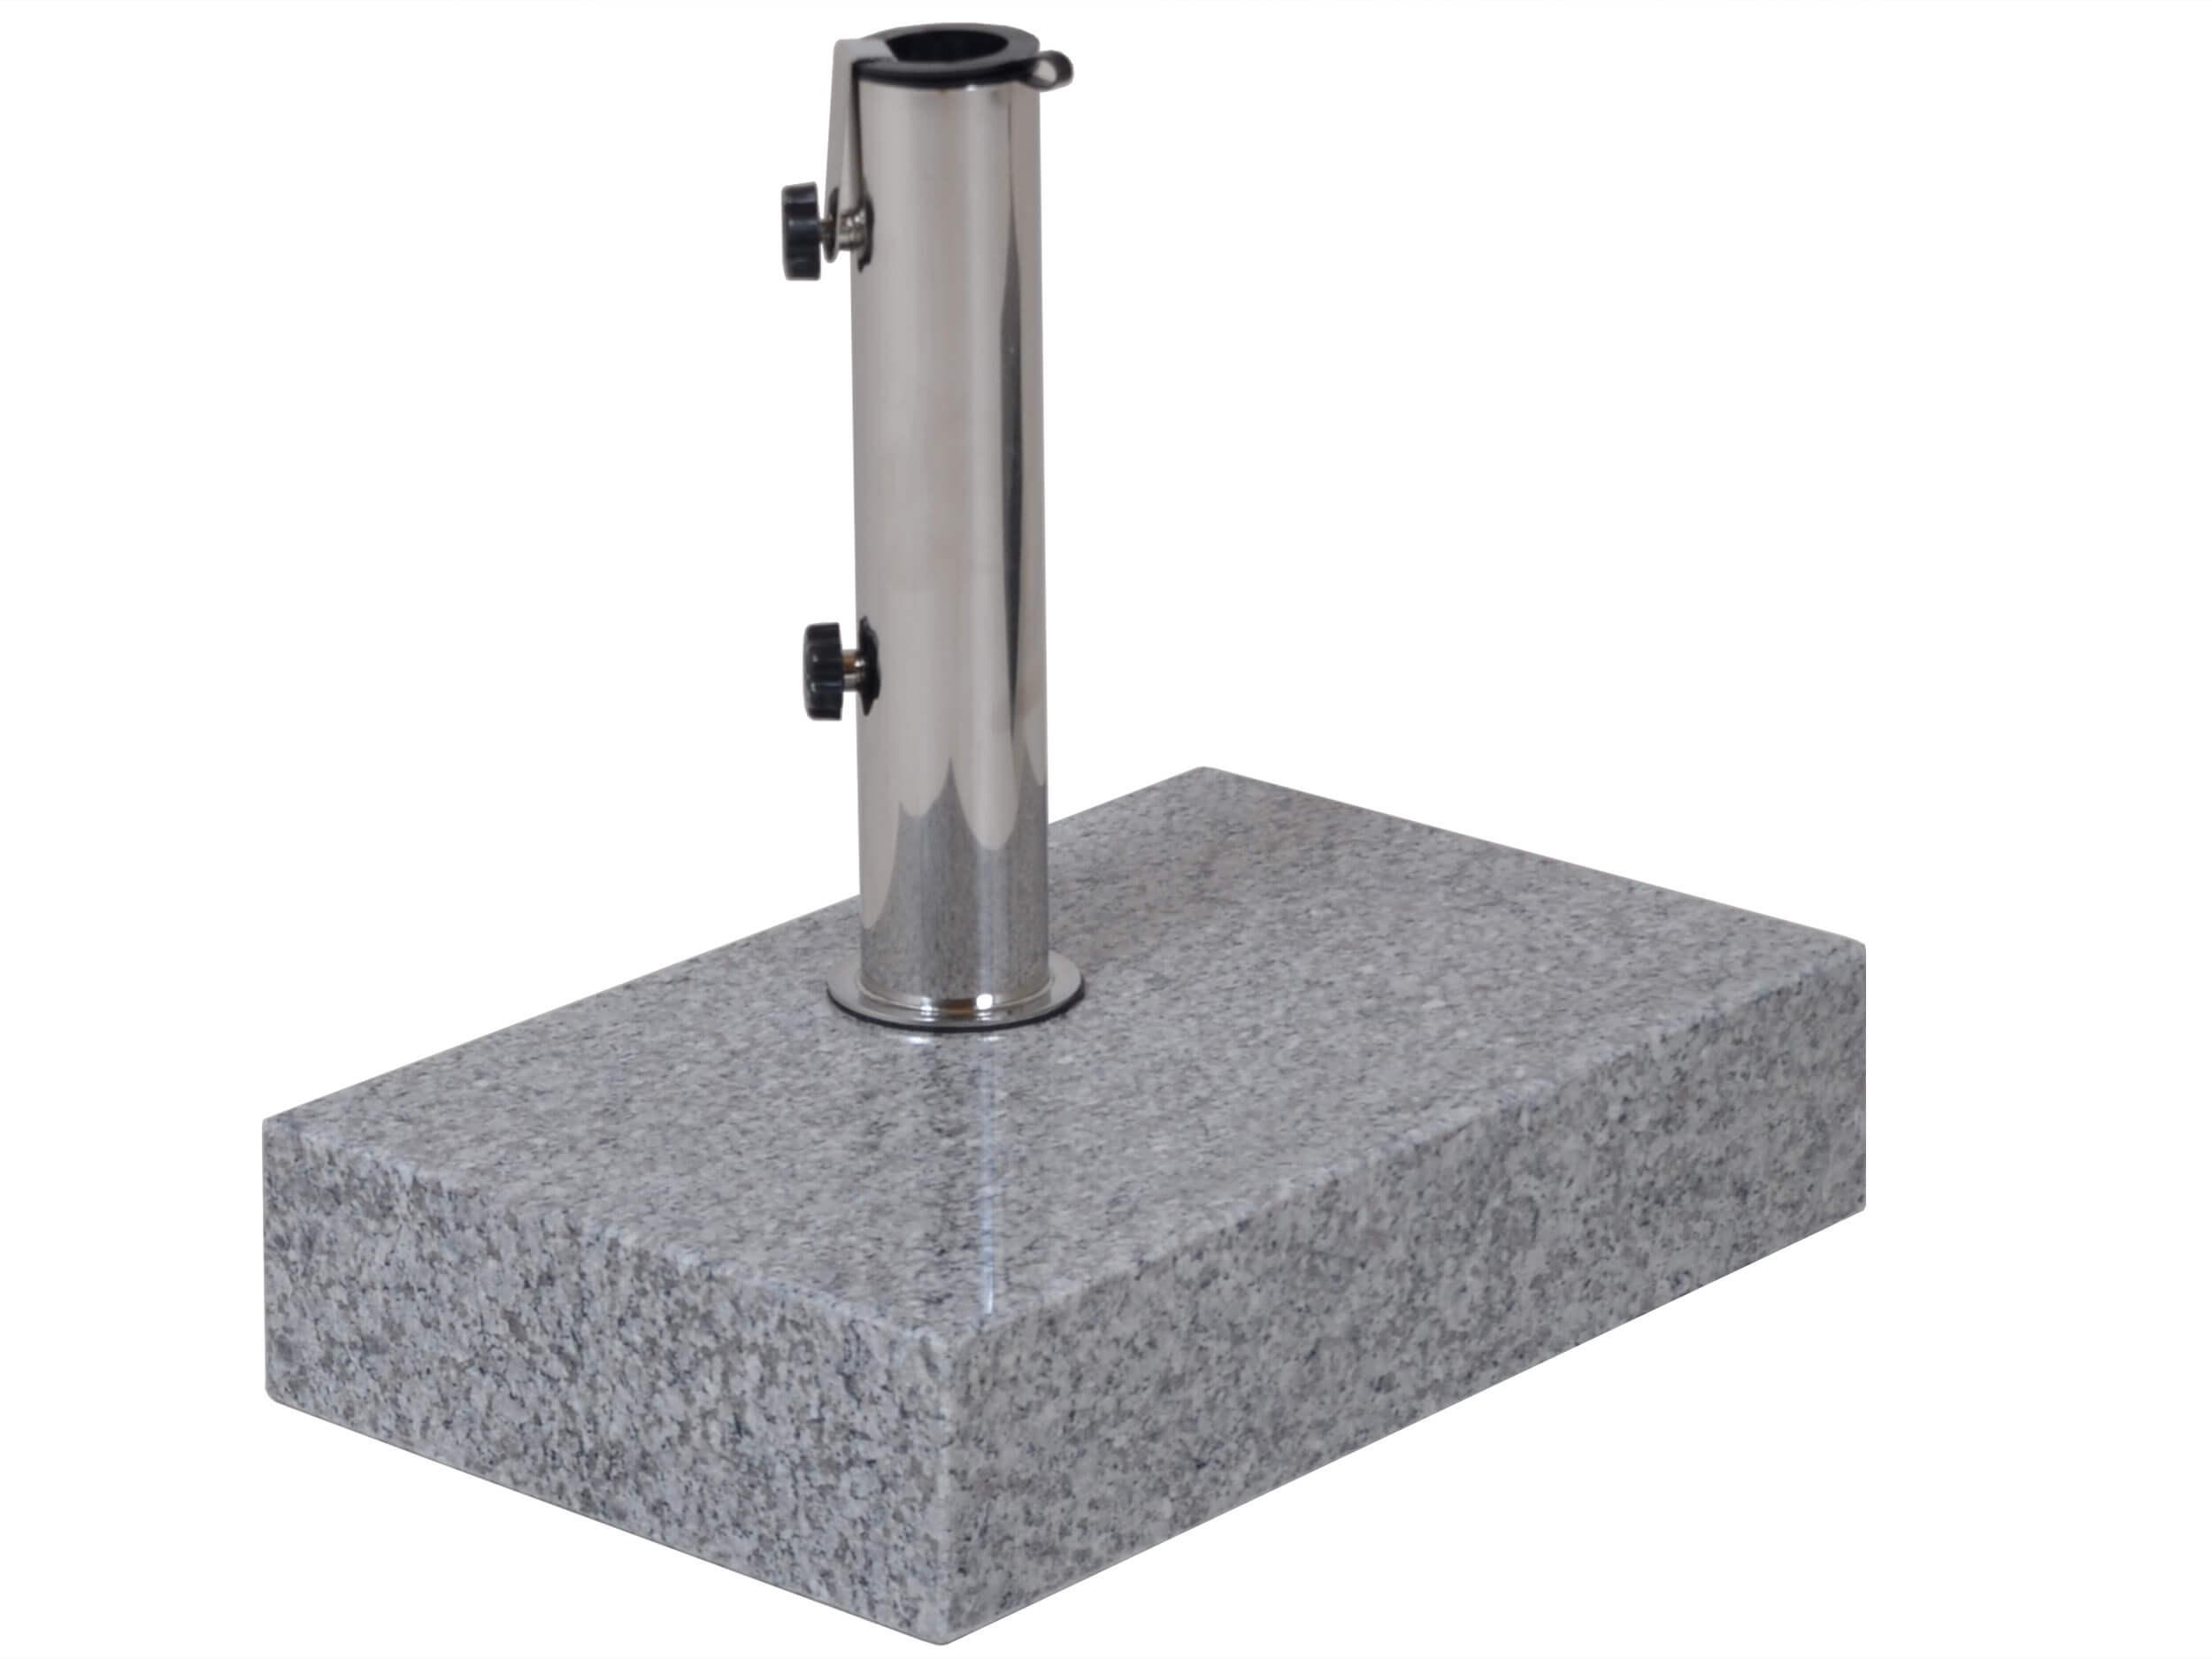 balkon sonnenschirmst nder 30kg granit grau gartenm bel. Black Bedroom Furniture Sets. Home Design Ideas